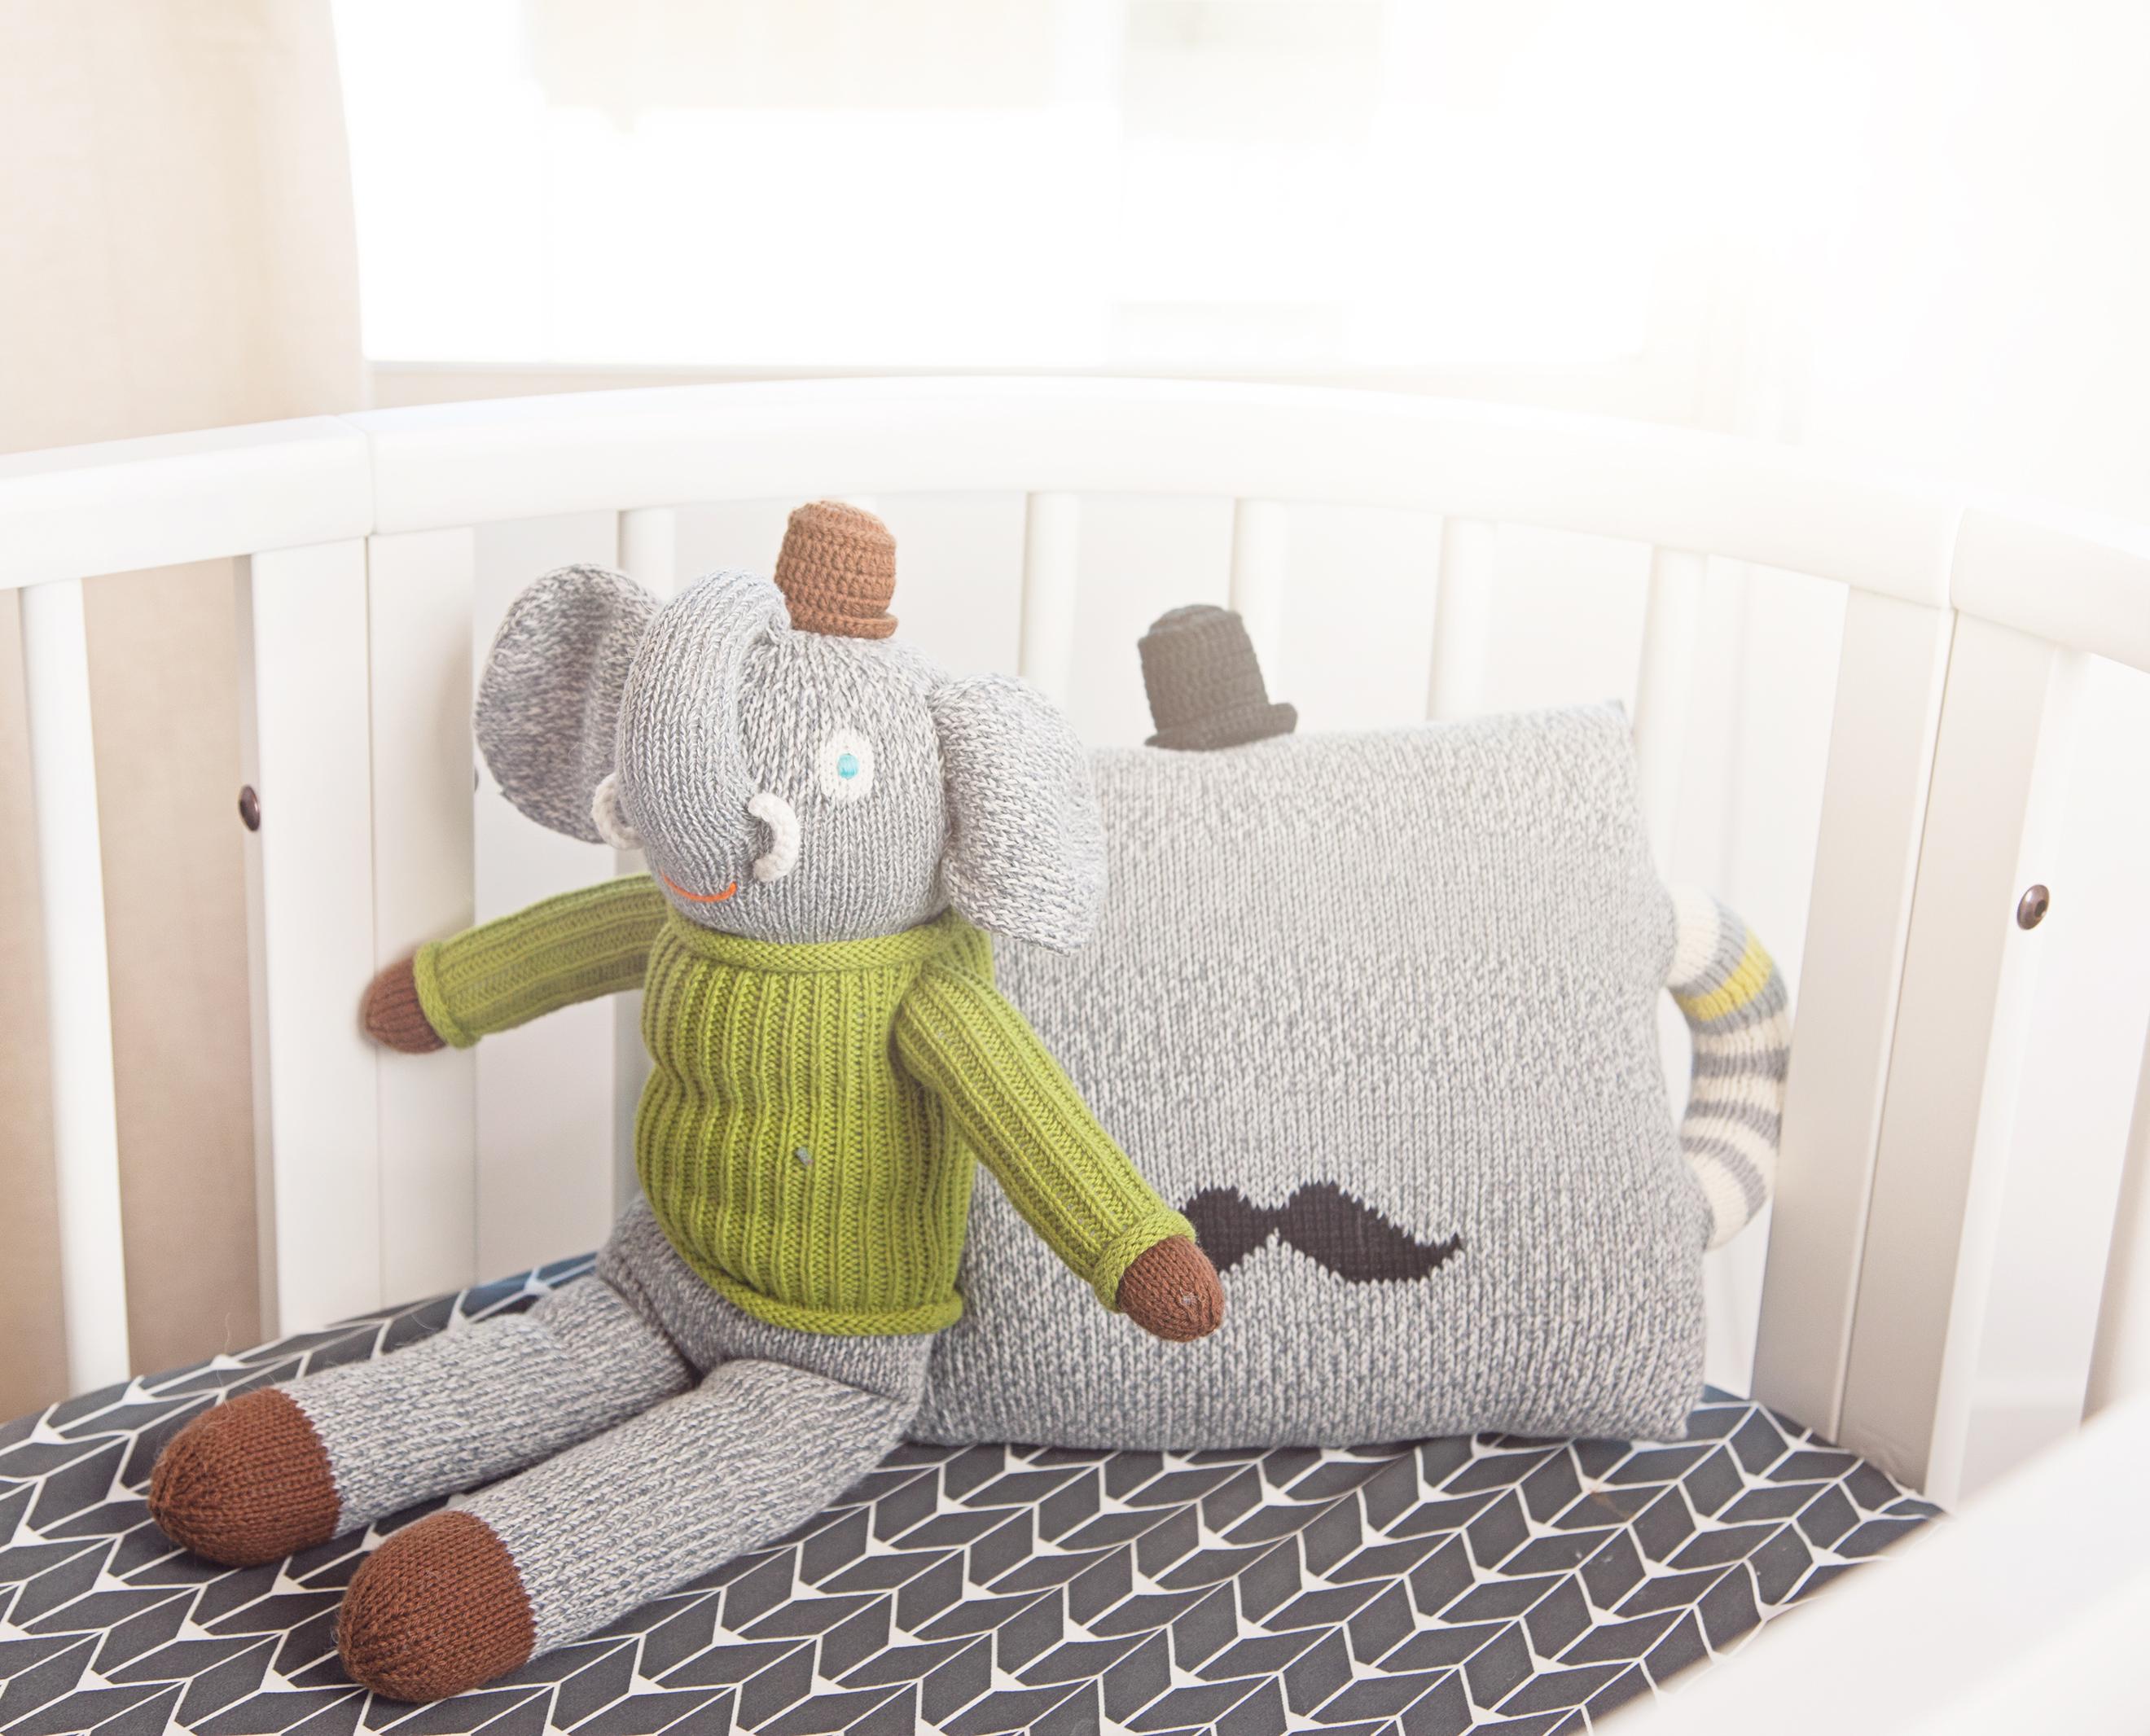 design reveal cara loren's nursery  project nursery - sleepi crib with oilo bedding and blabla toys